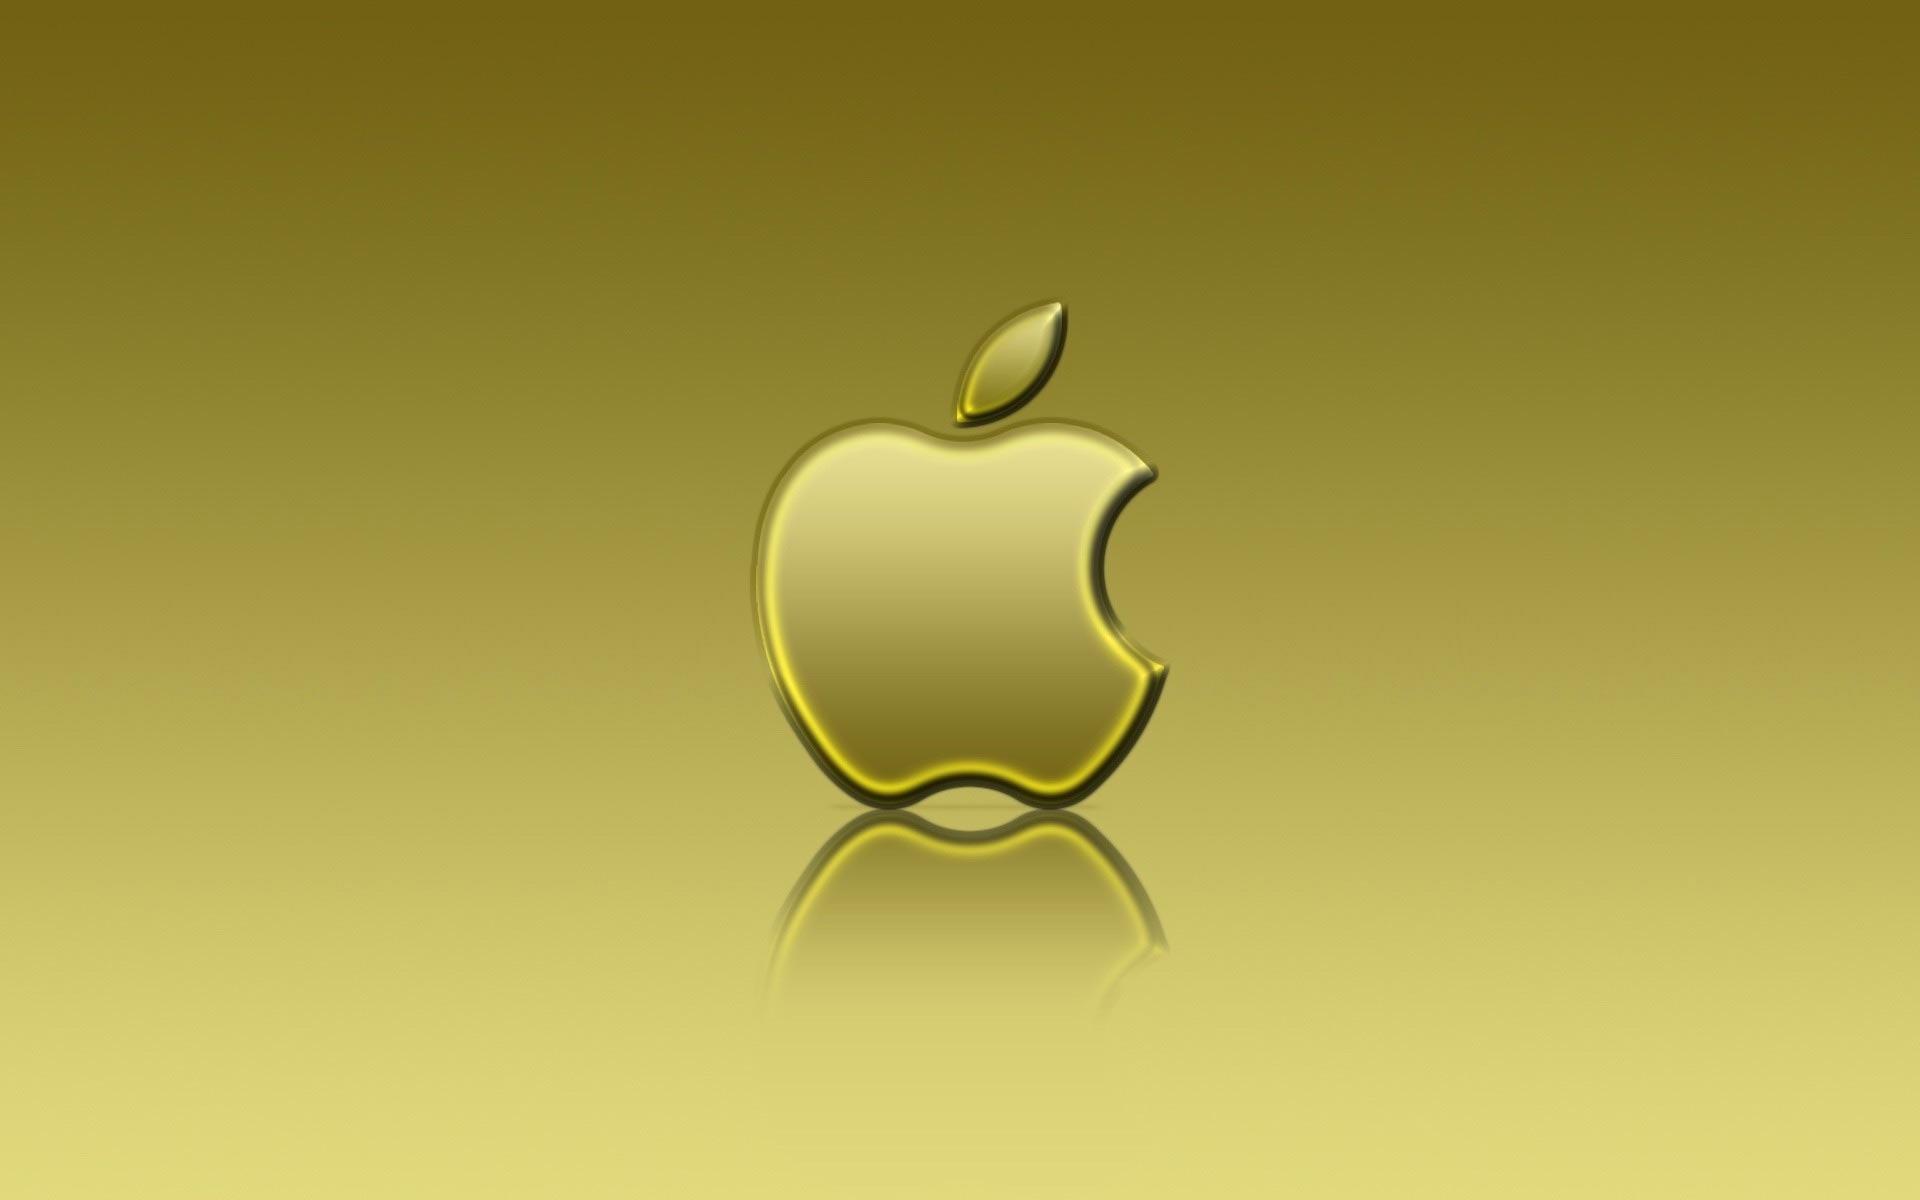 Apple Logo Design App